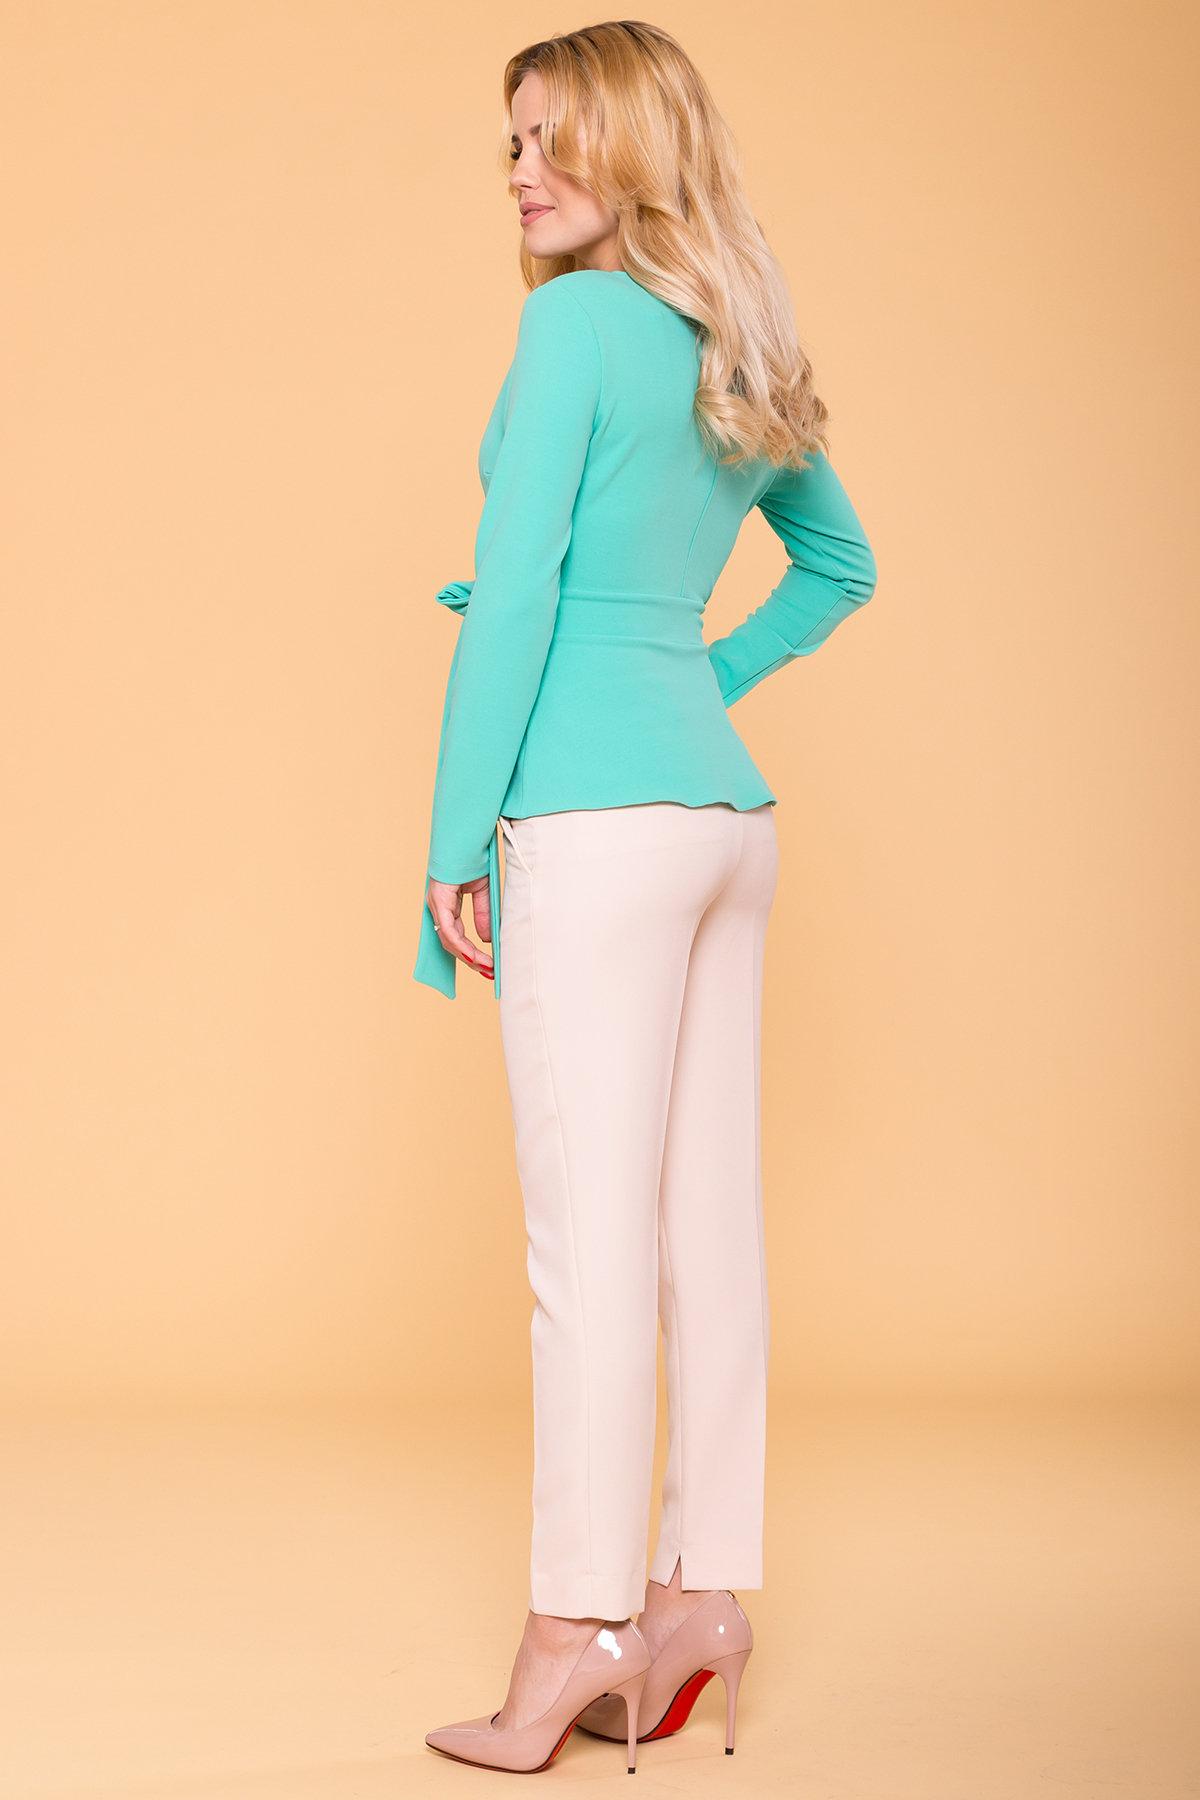 Блуза  Марсо 6432 АРТ. 41430 Цвет: Бирюзa - фото 2, интернет магазин tm-modus.ru